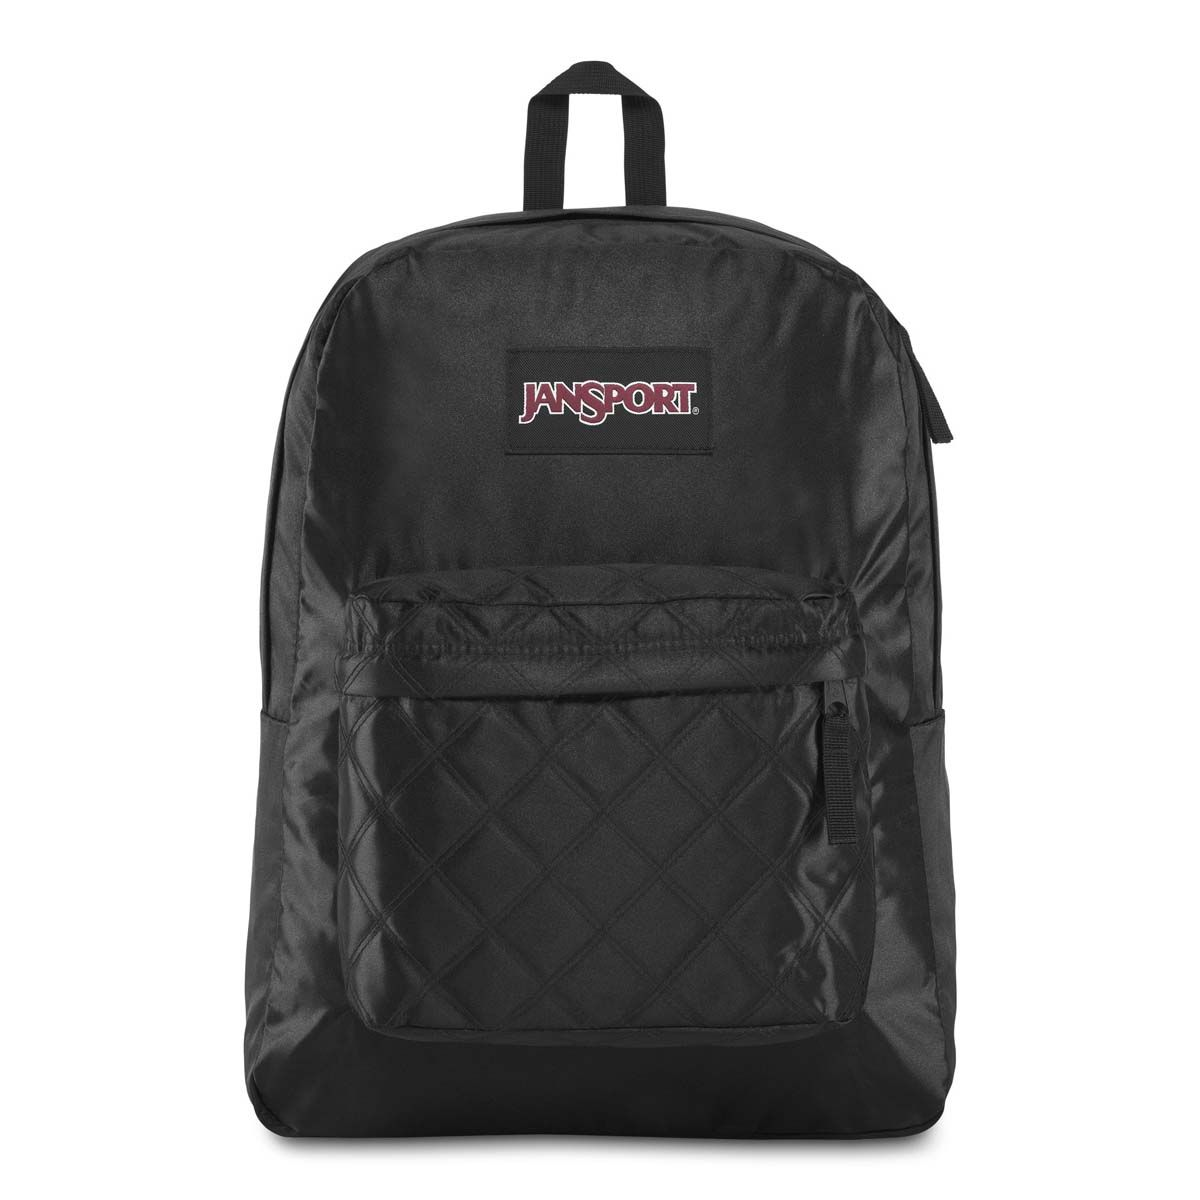 JanSport Super FX Backpack in Black Satin Diamond Quilting